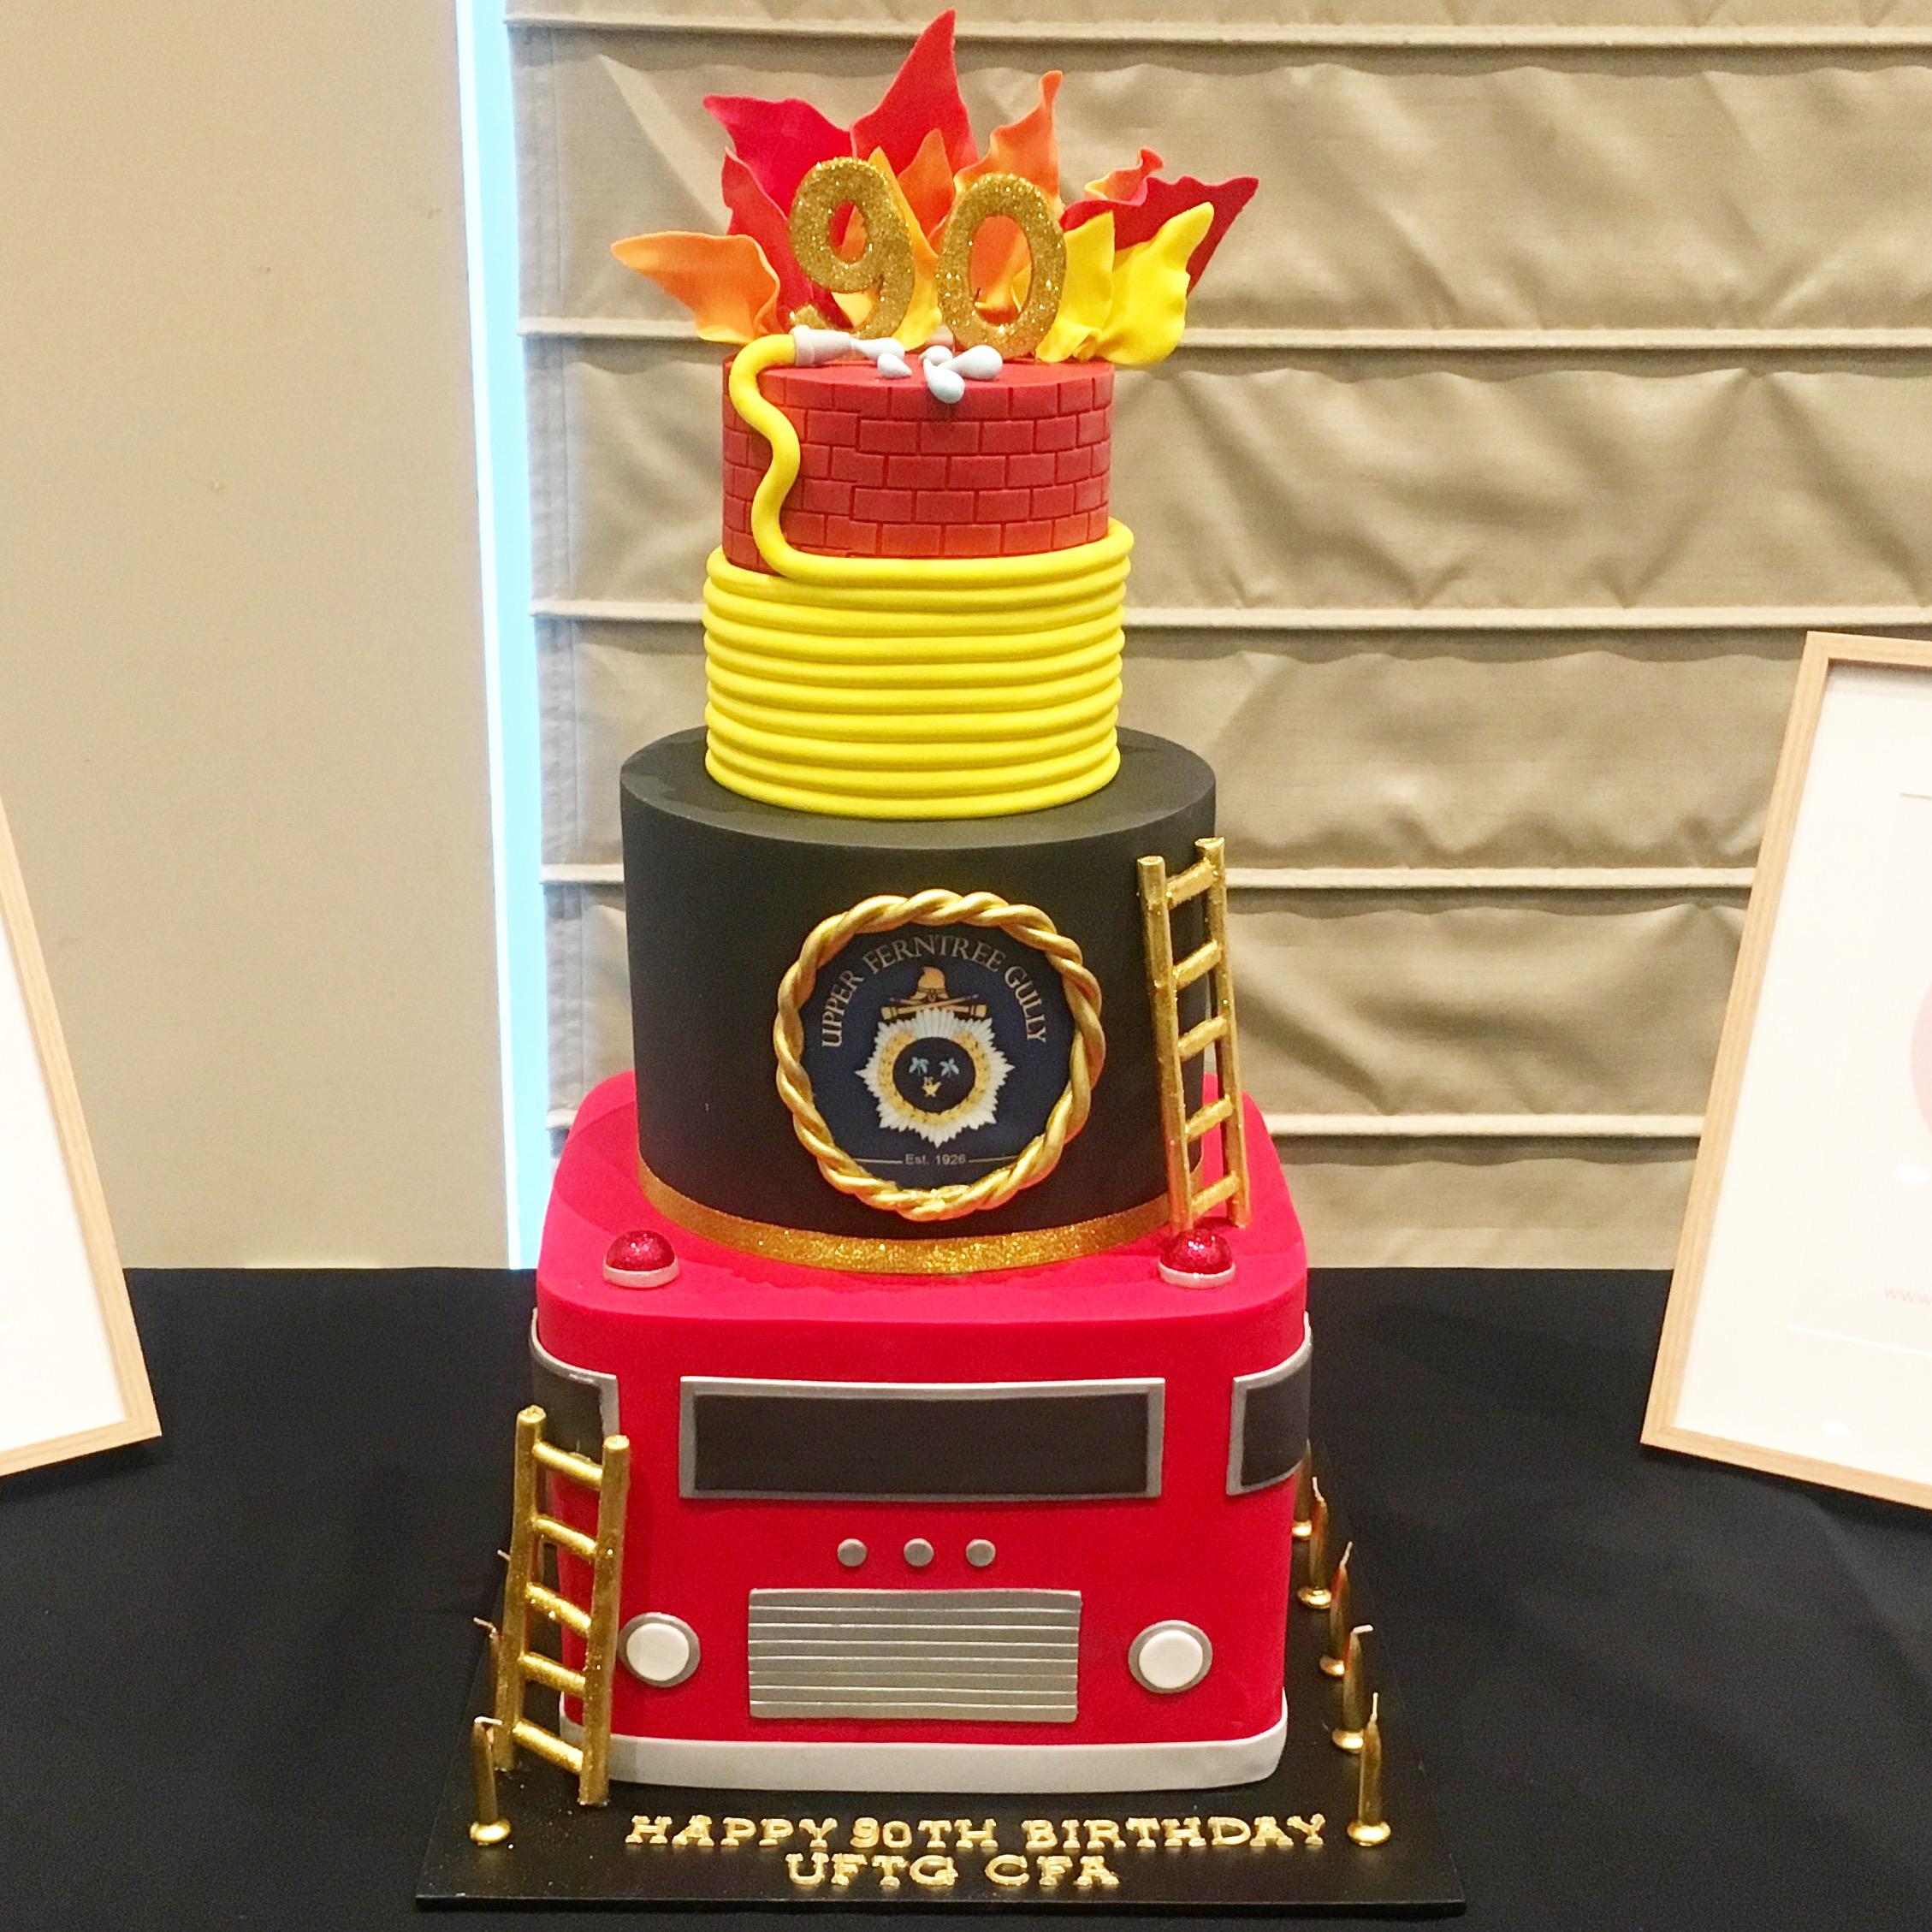 UFTG CFA 90th Birthday Firetruck Cake